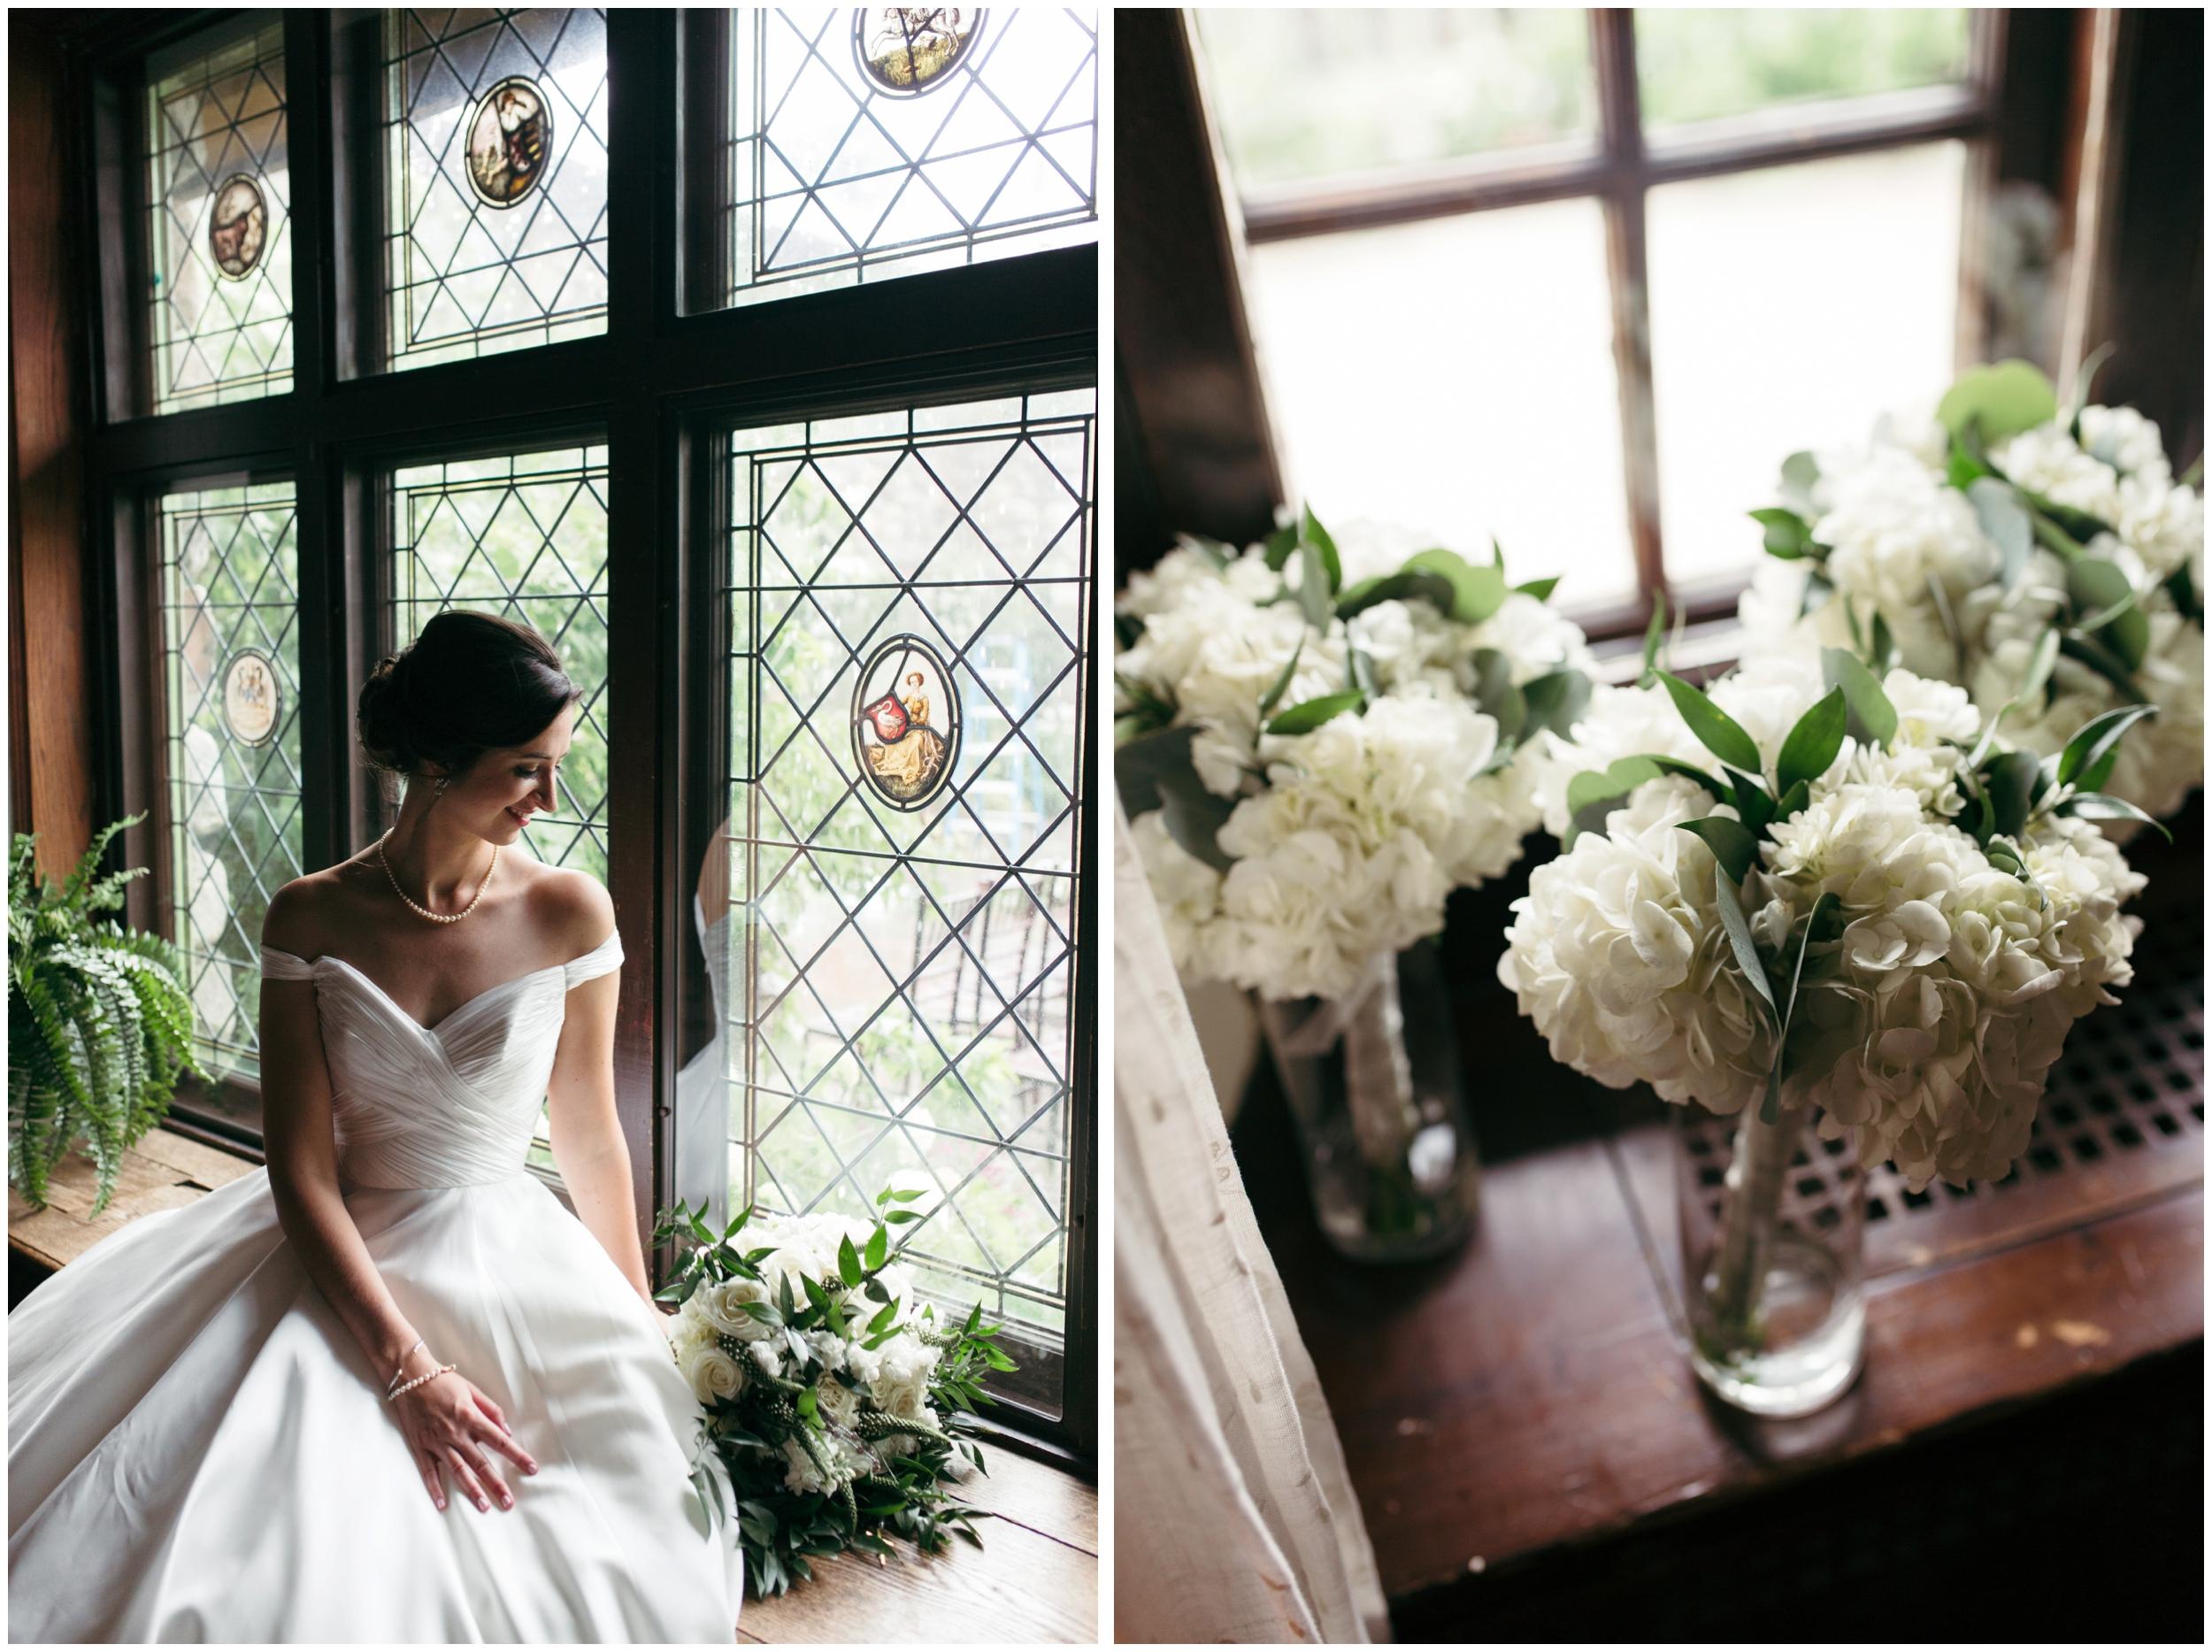 Willowdale-Estate-Wedding-Bailey-Q-Photo-Boston-Wedding-Photographer-003.JPG